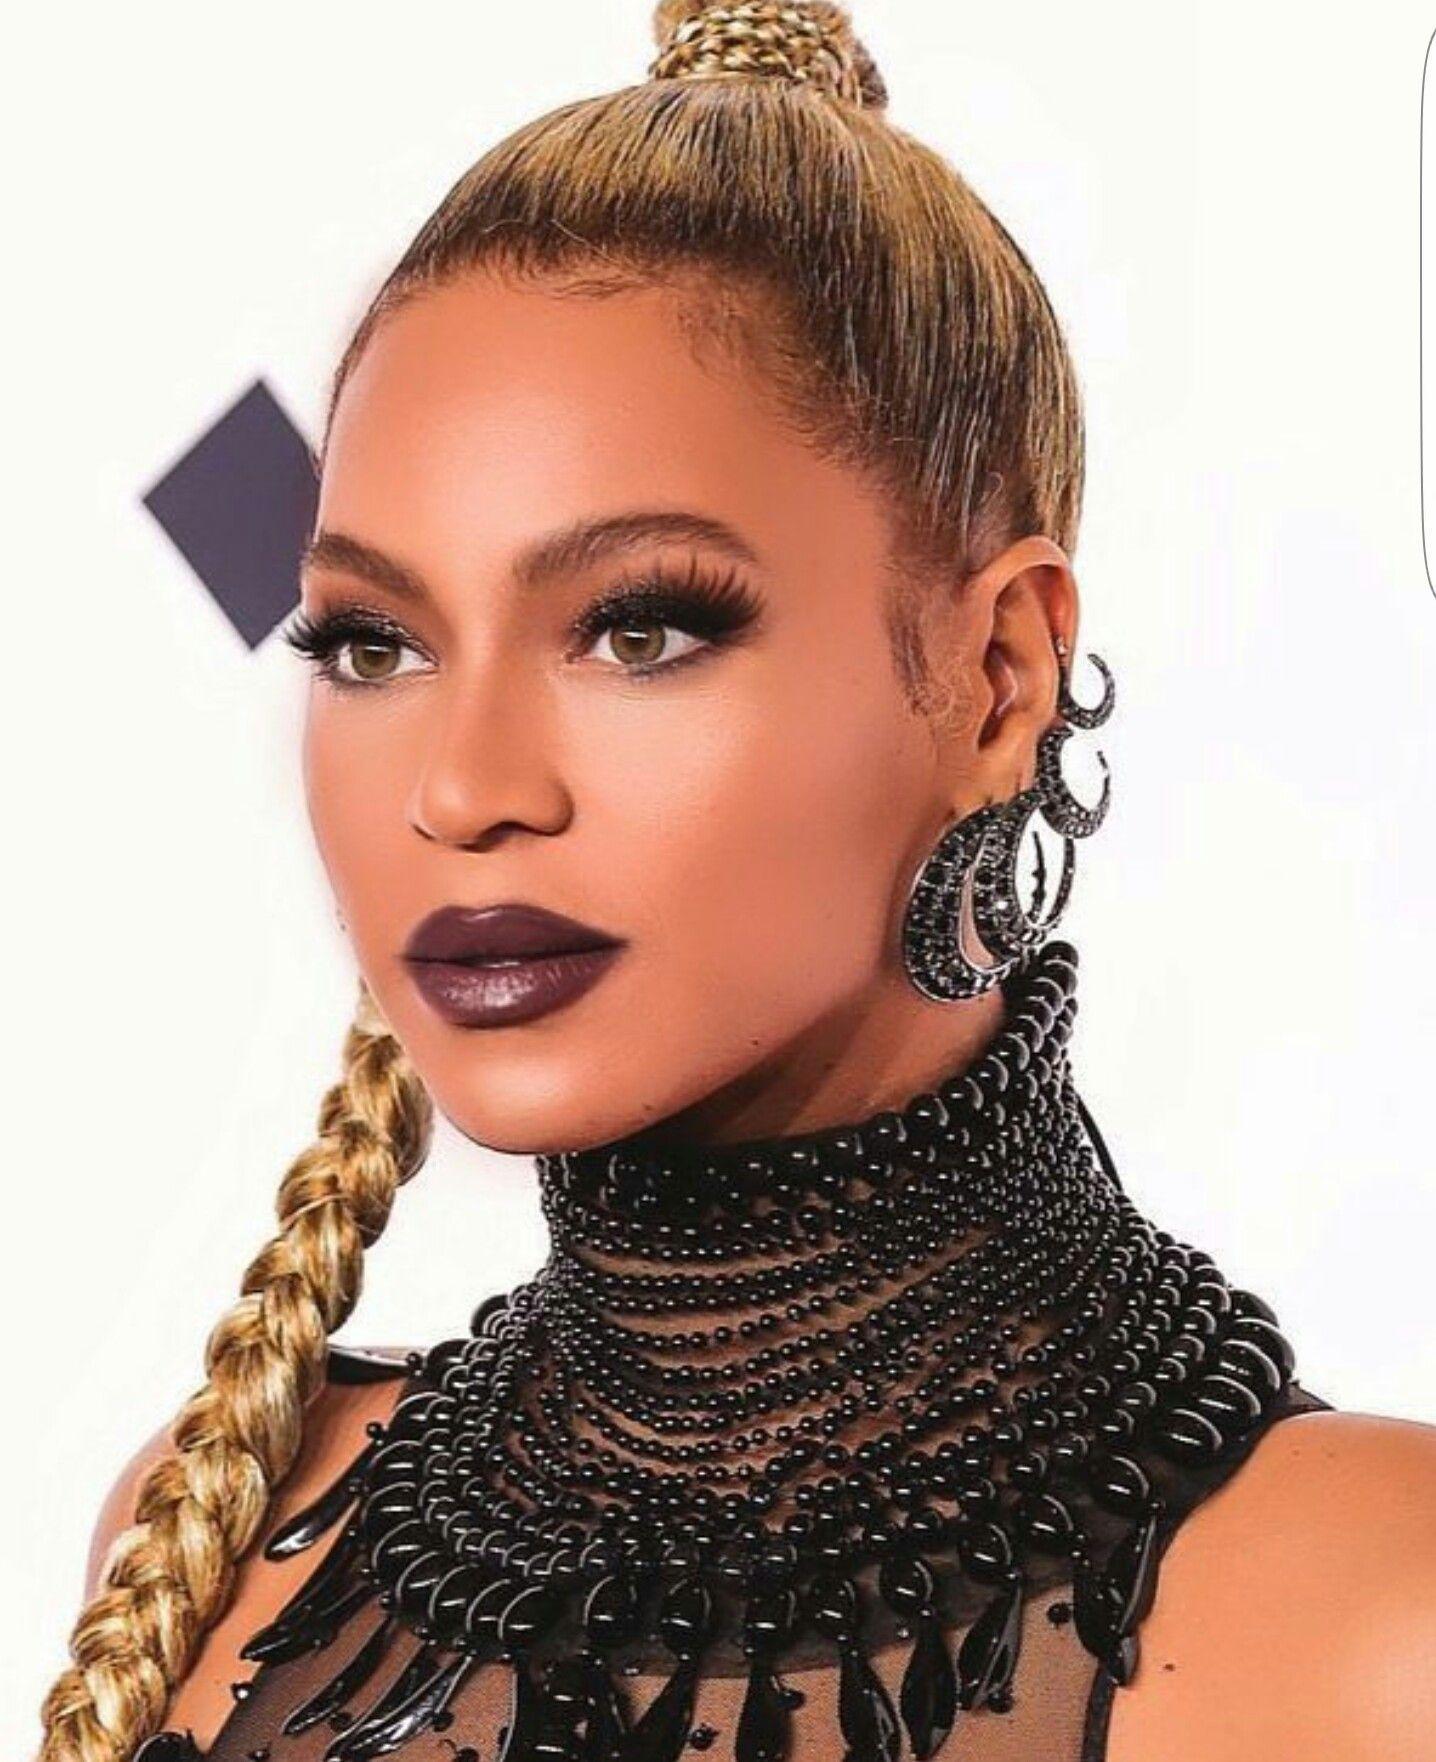 Beyonce In 2019 Beyonce Makeup Beyonce Celebrity Makeup